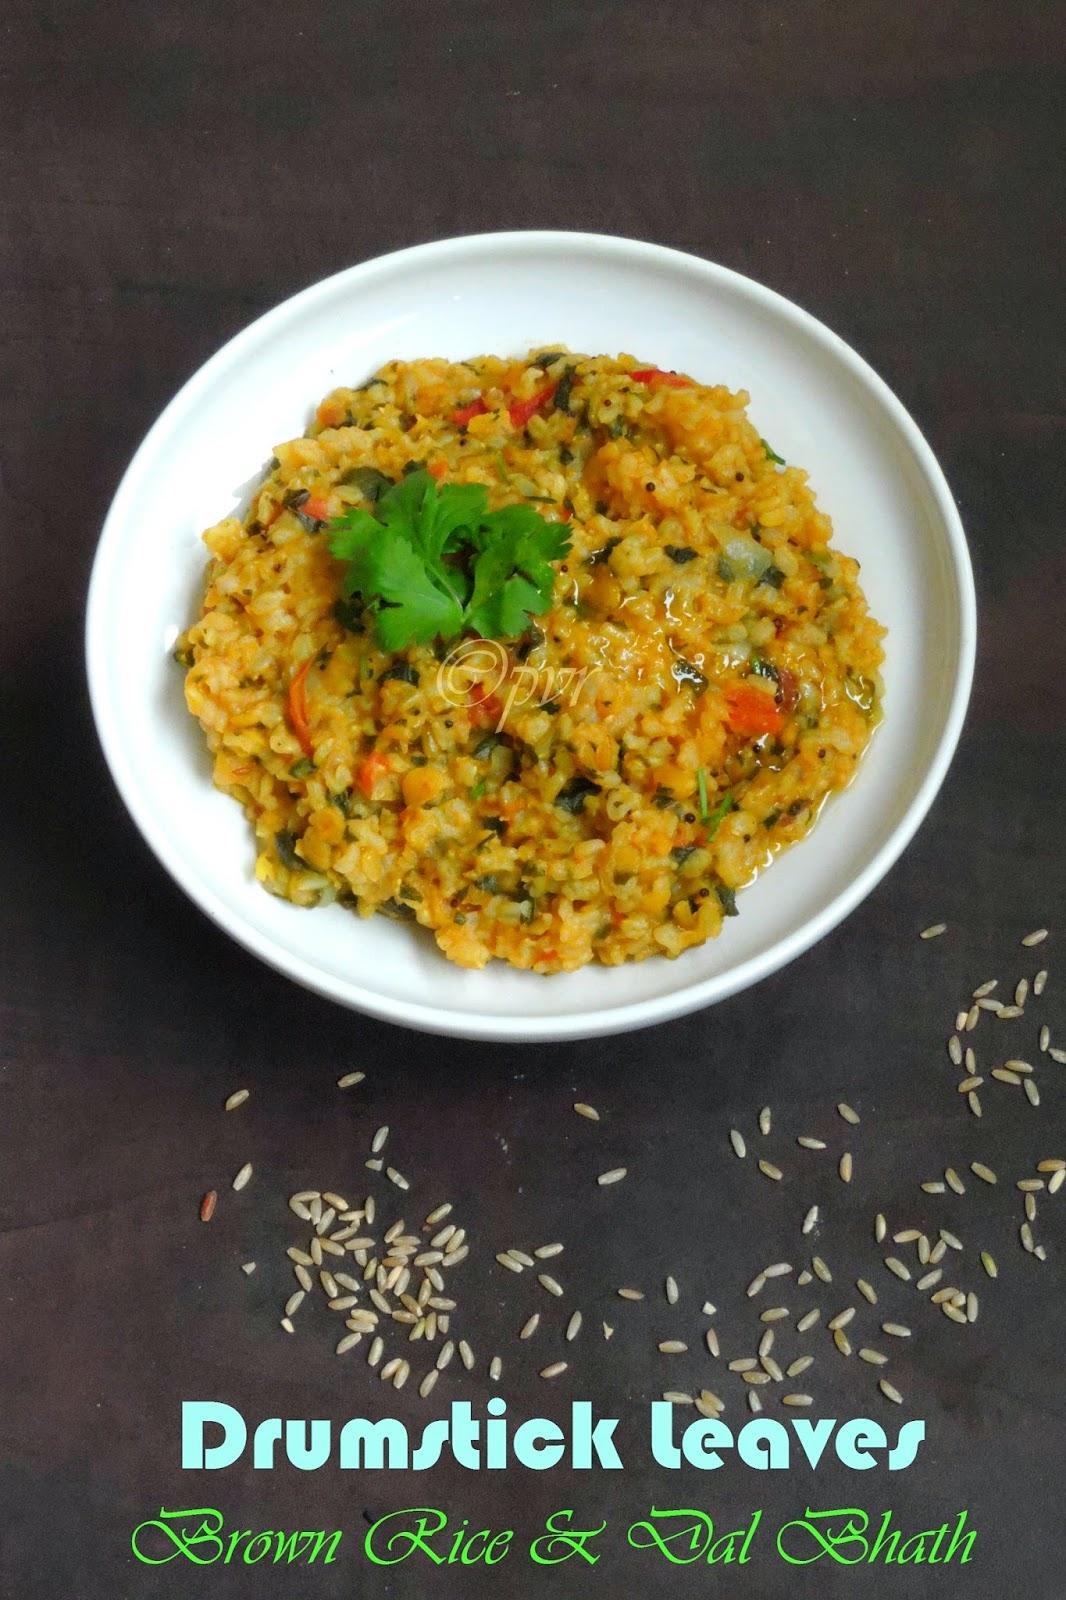 Drumstick leaves Dal Baath, Brown Rice dal bhath